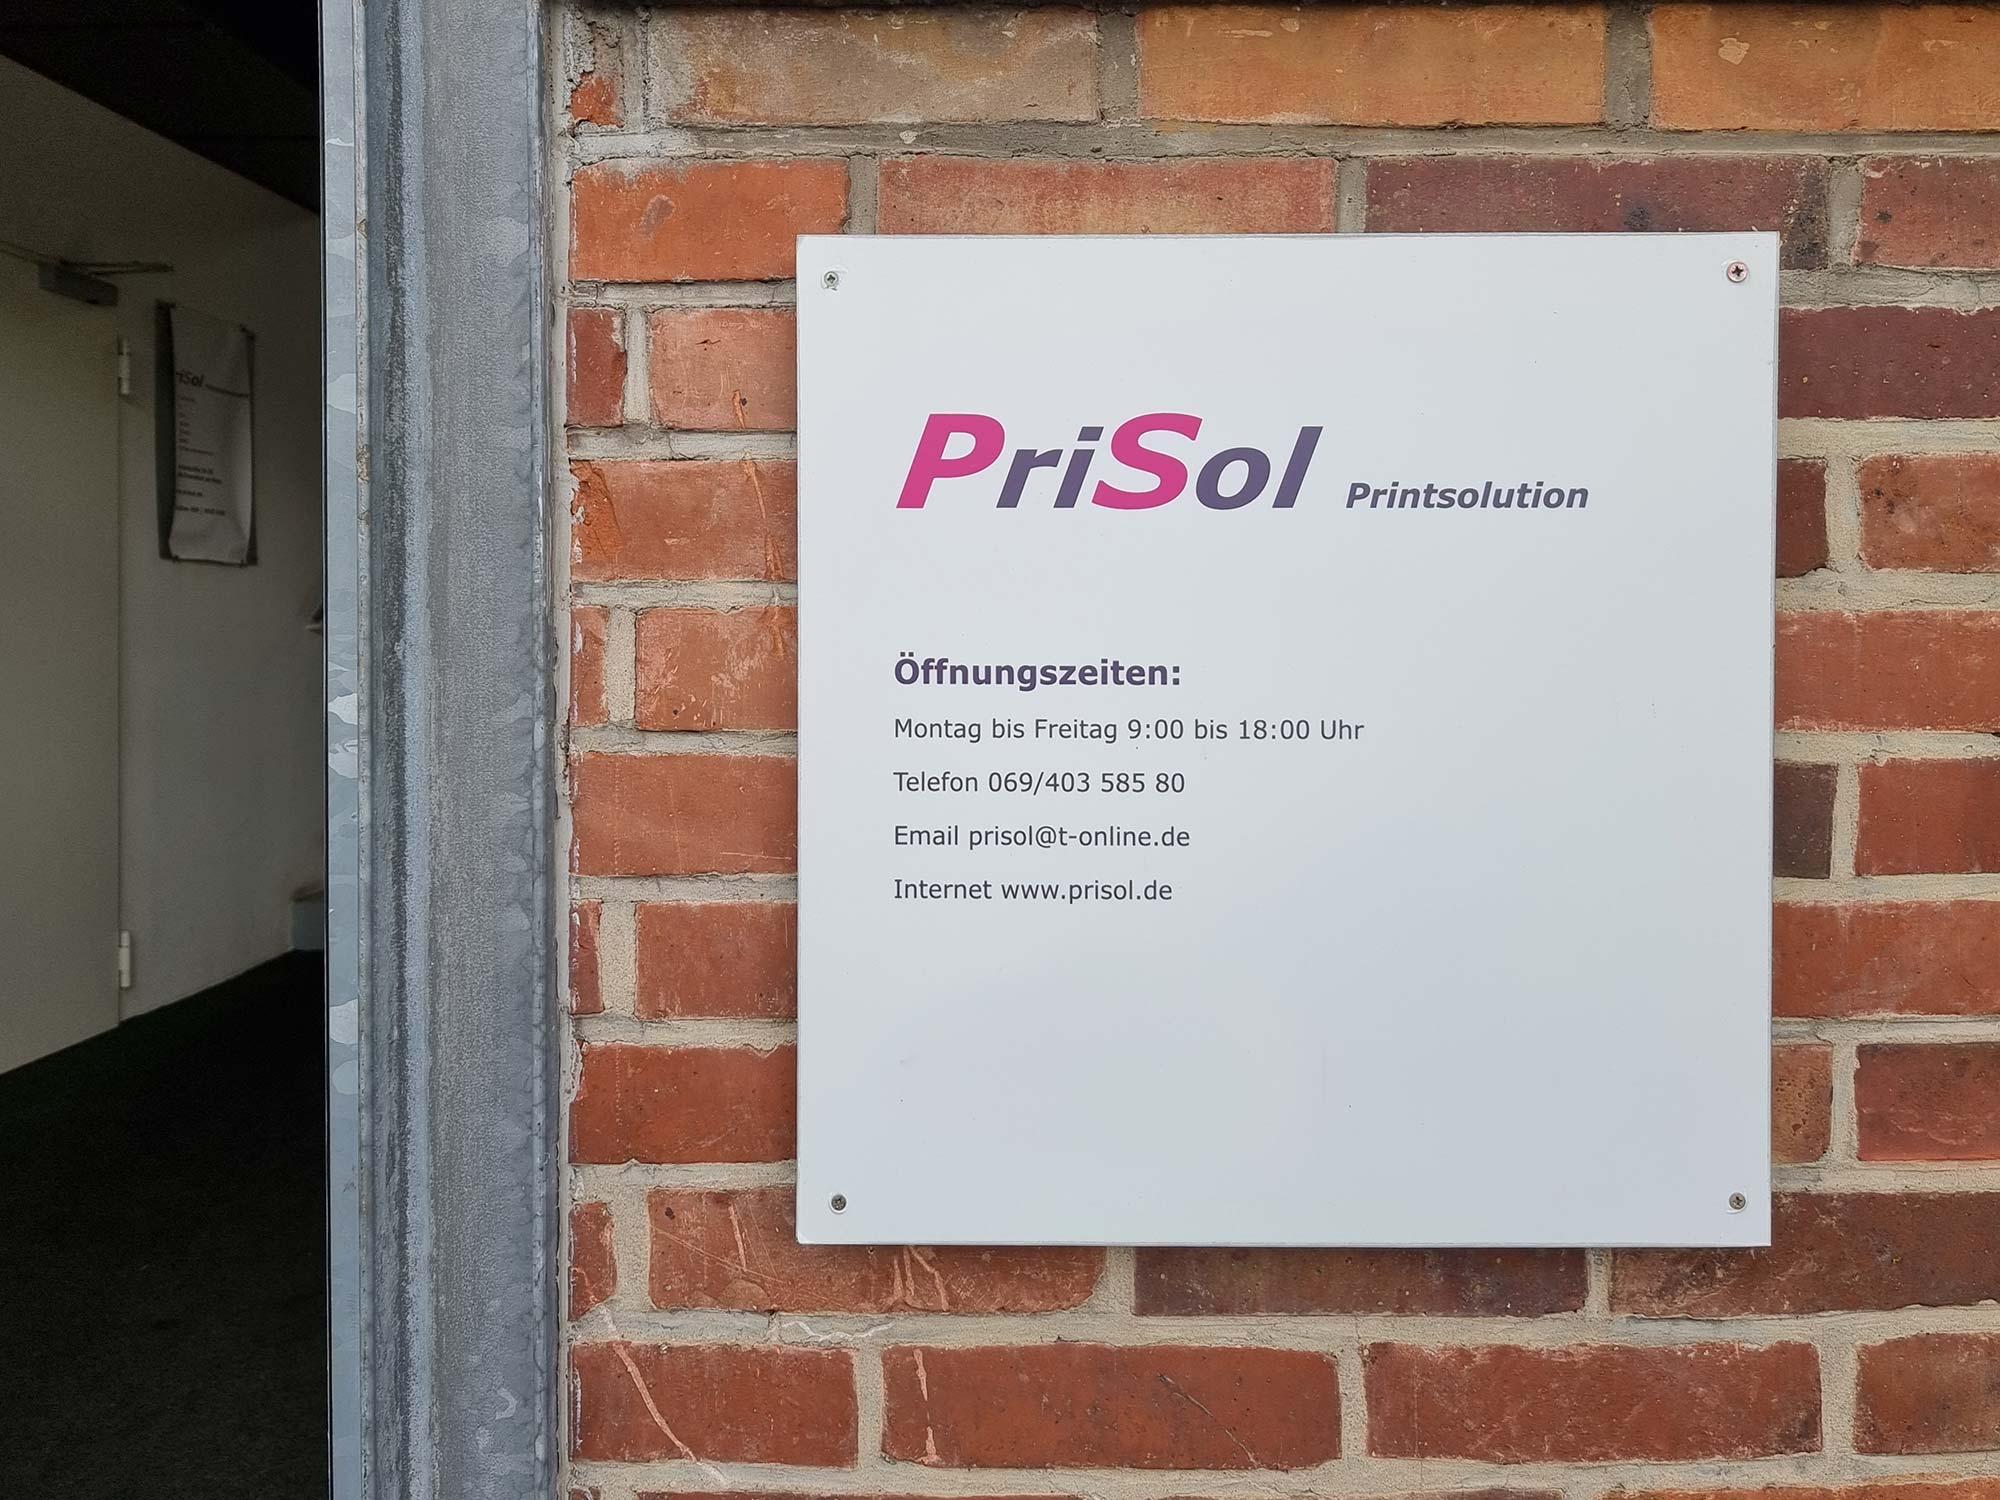 PriSol Frankfurt am Main - Gwinnerstraße - PriSol Adresse - Prisol FFM